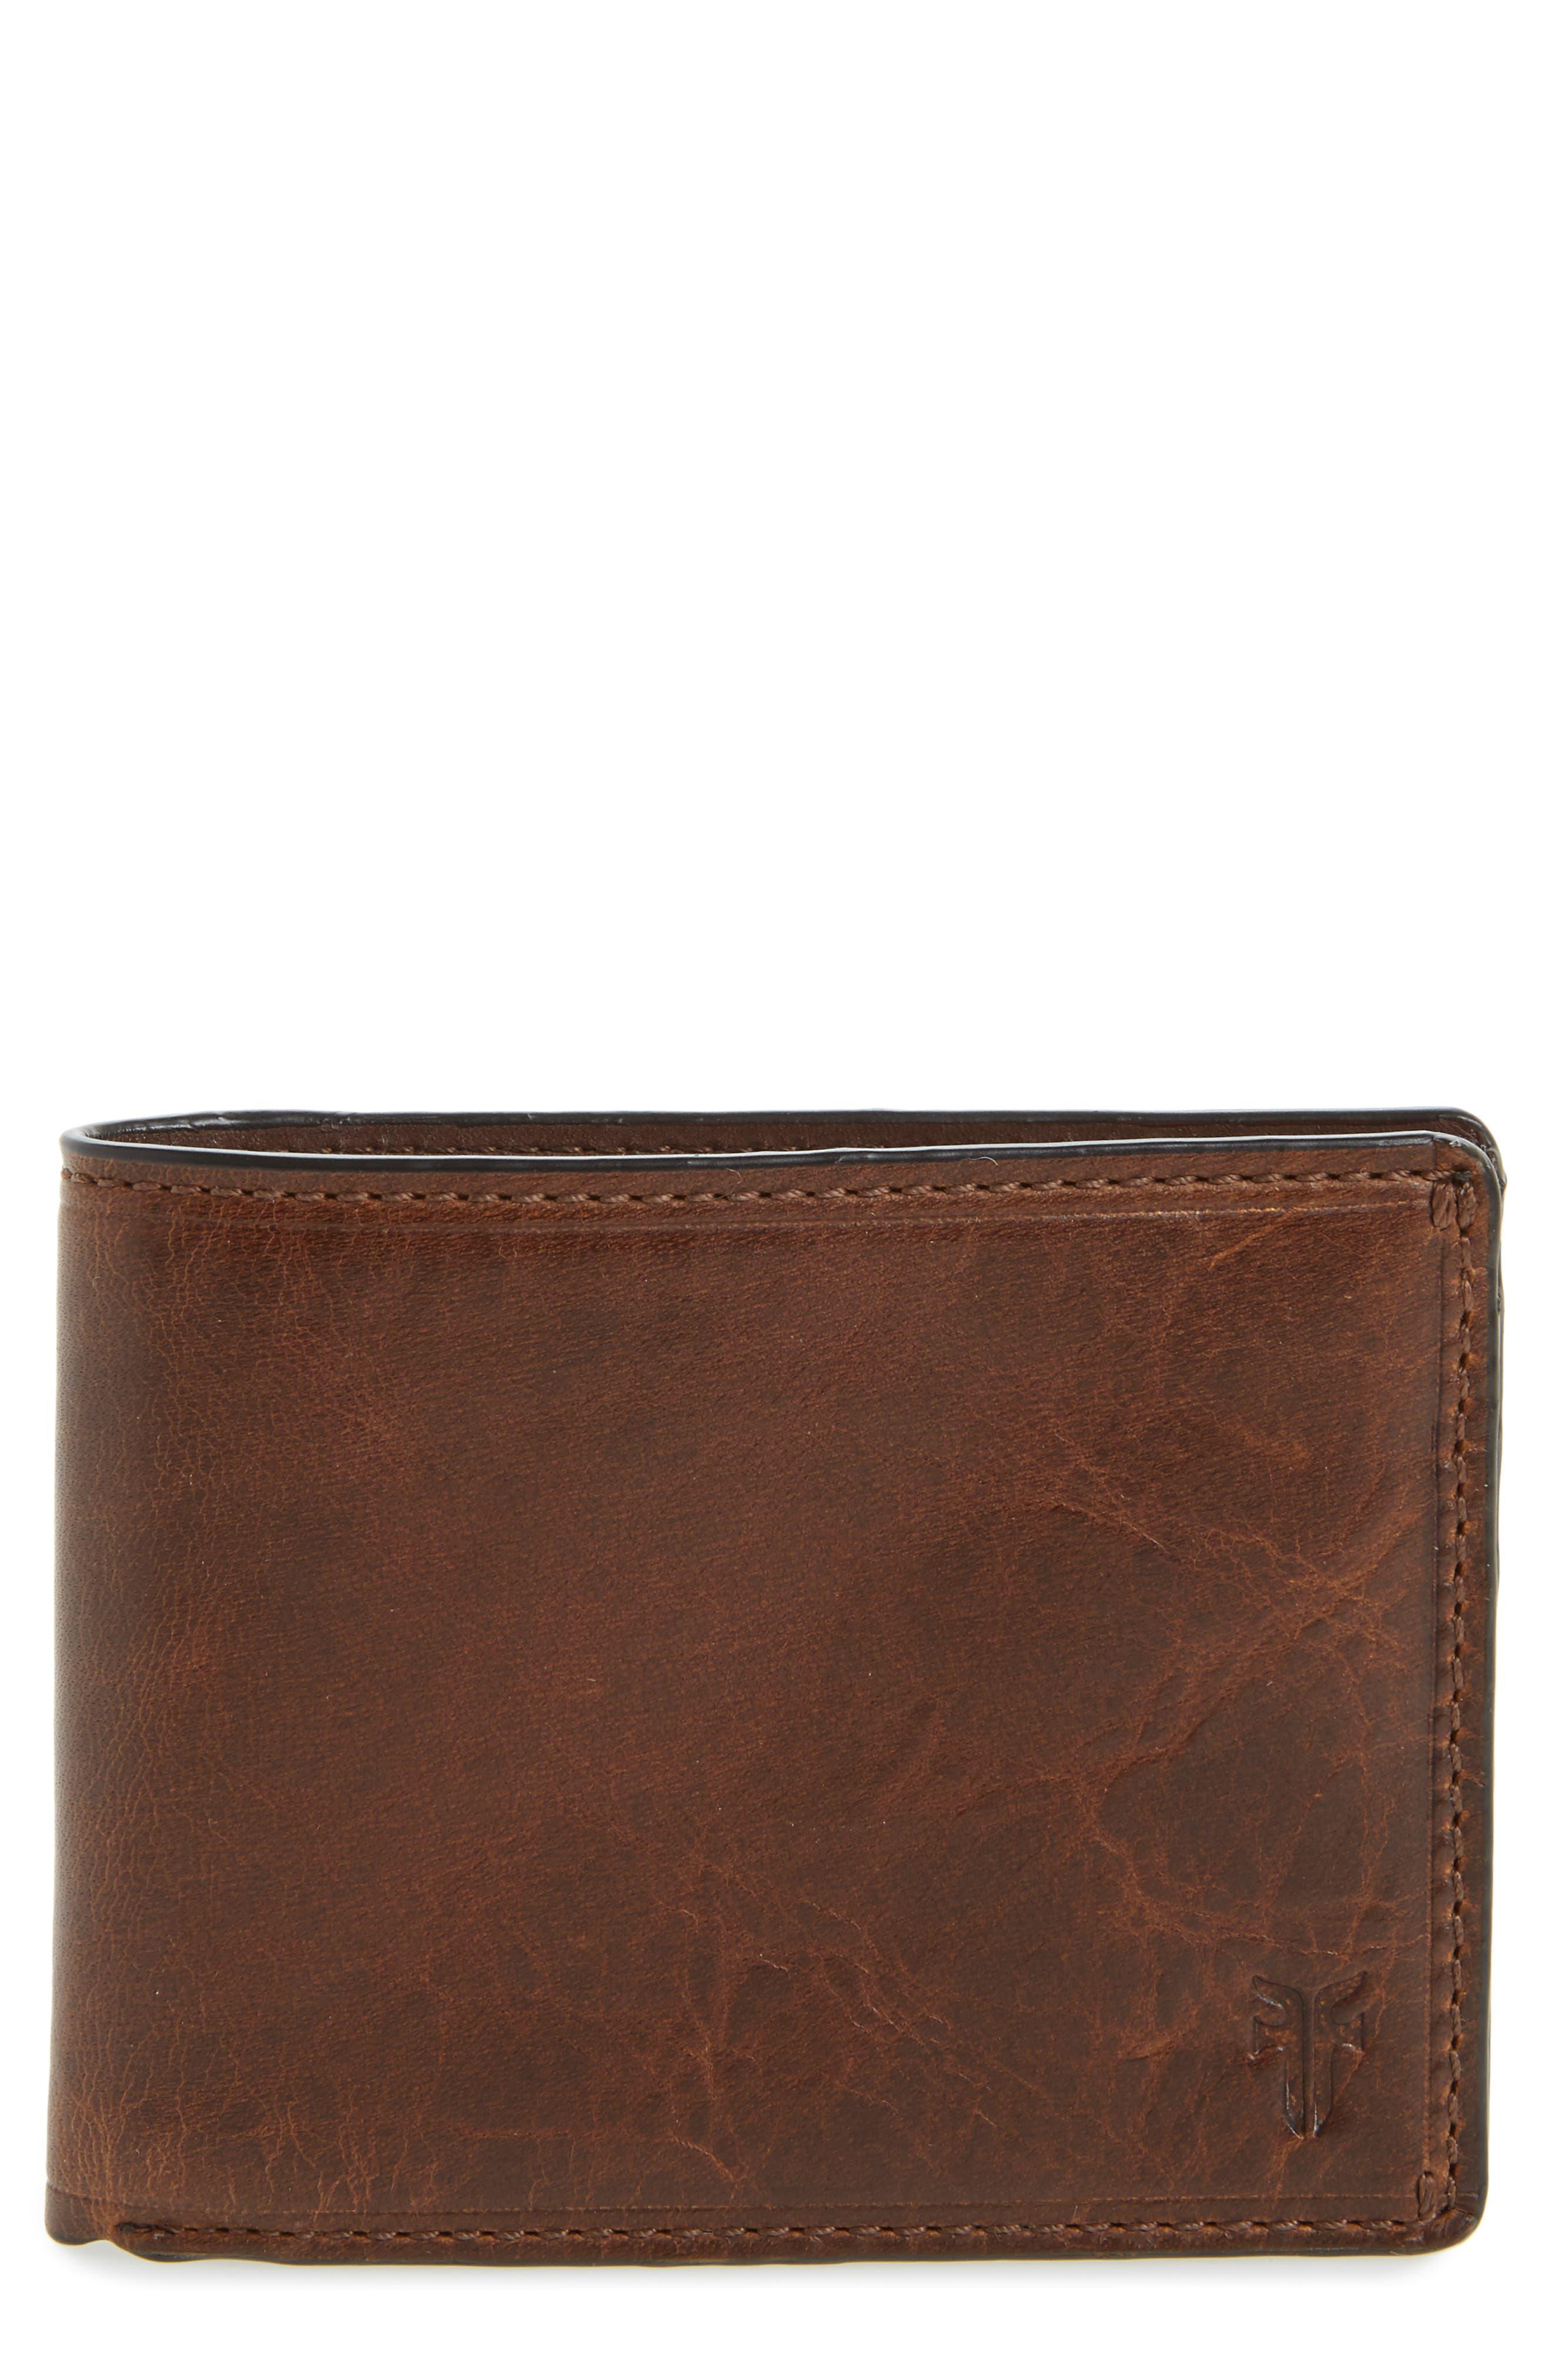 Logan Leather Wallet,                             Main thumbnail 1, color,                             DARK BROWN